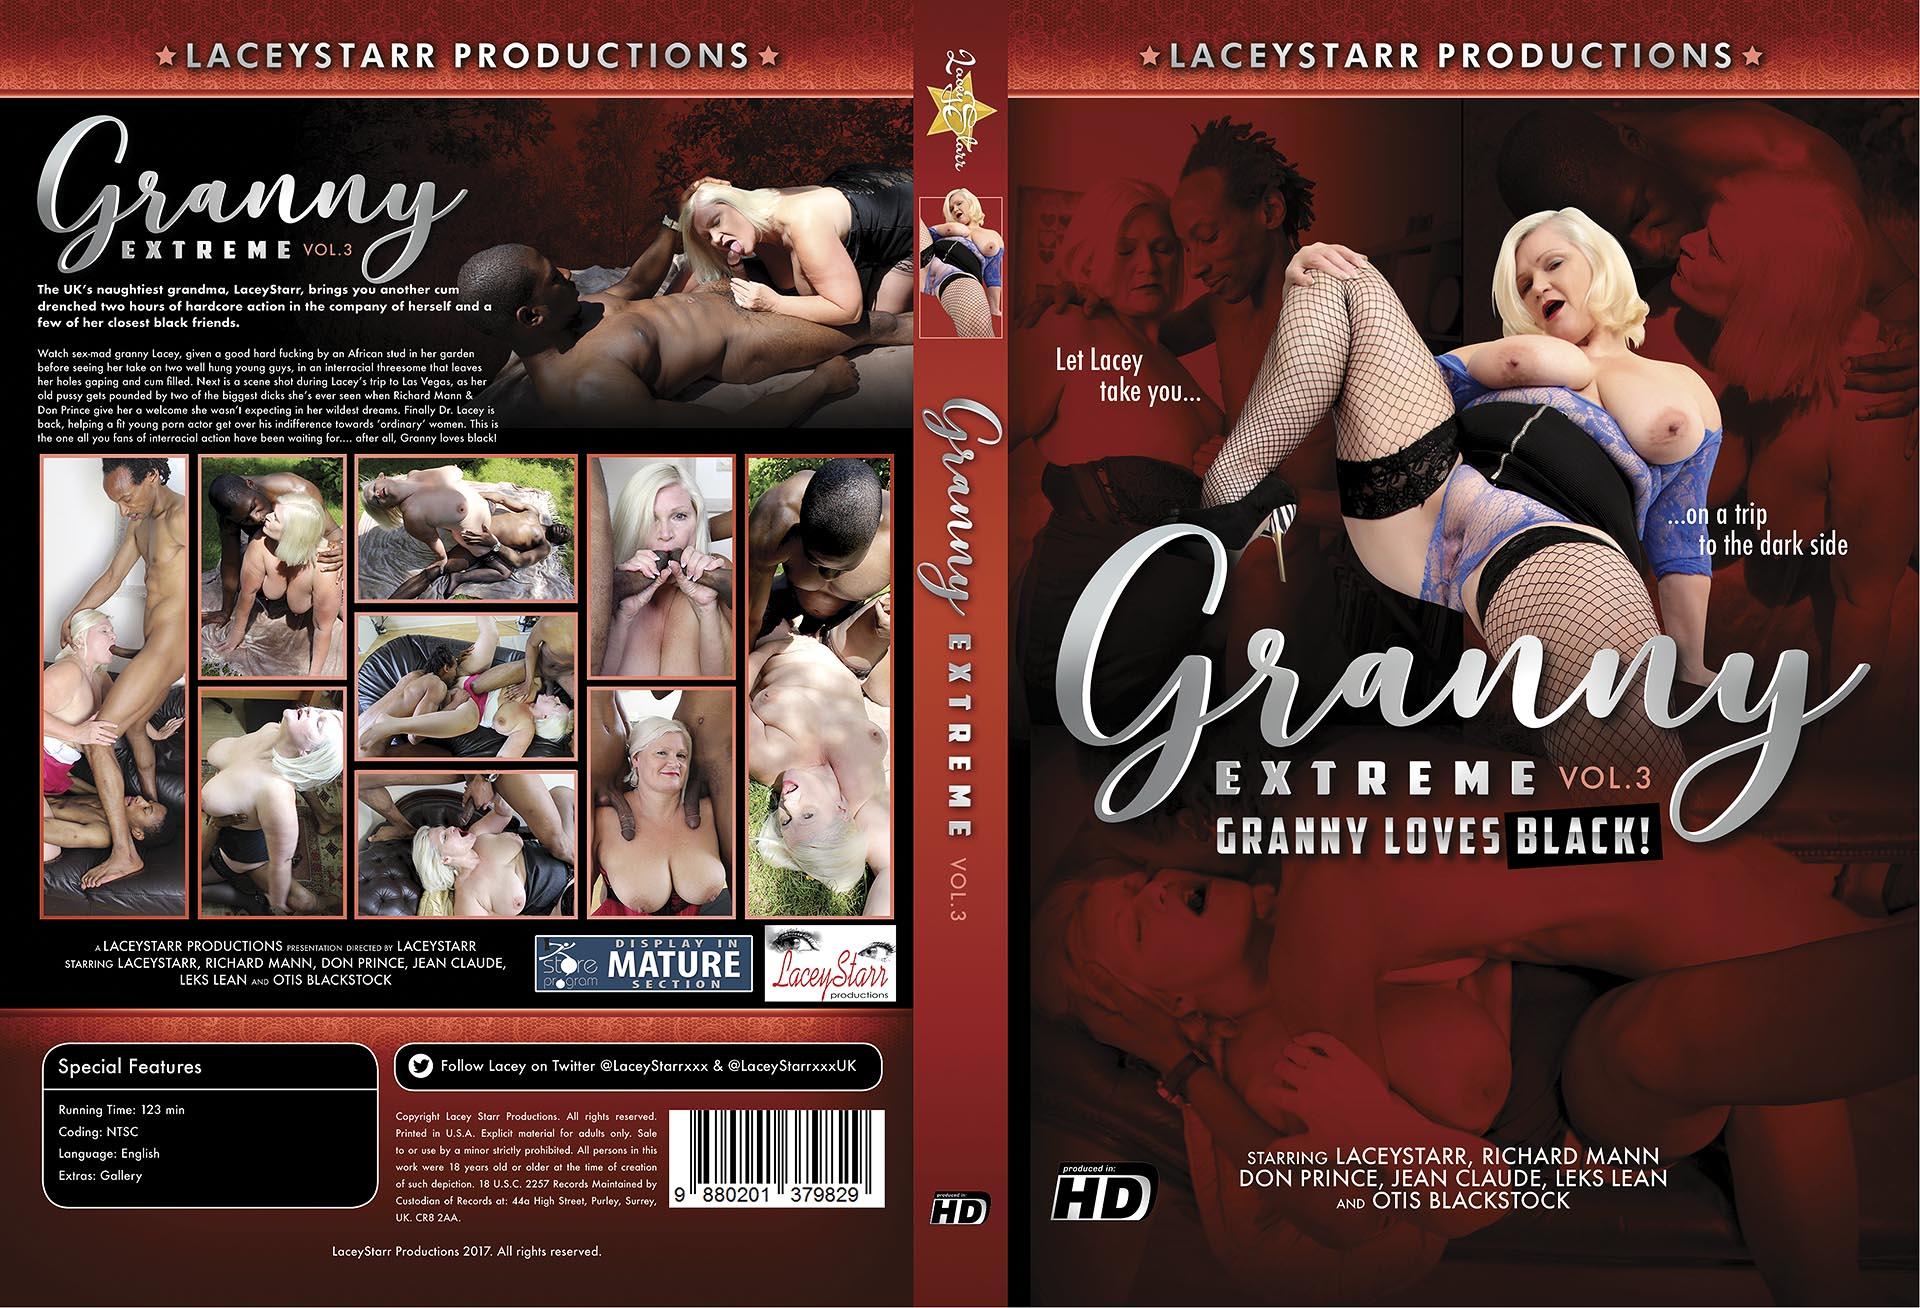 LS_GrannyExtreme_Volume3_UK_Sleeve_Large.jpg